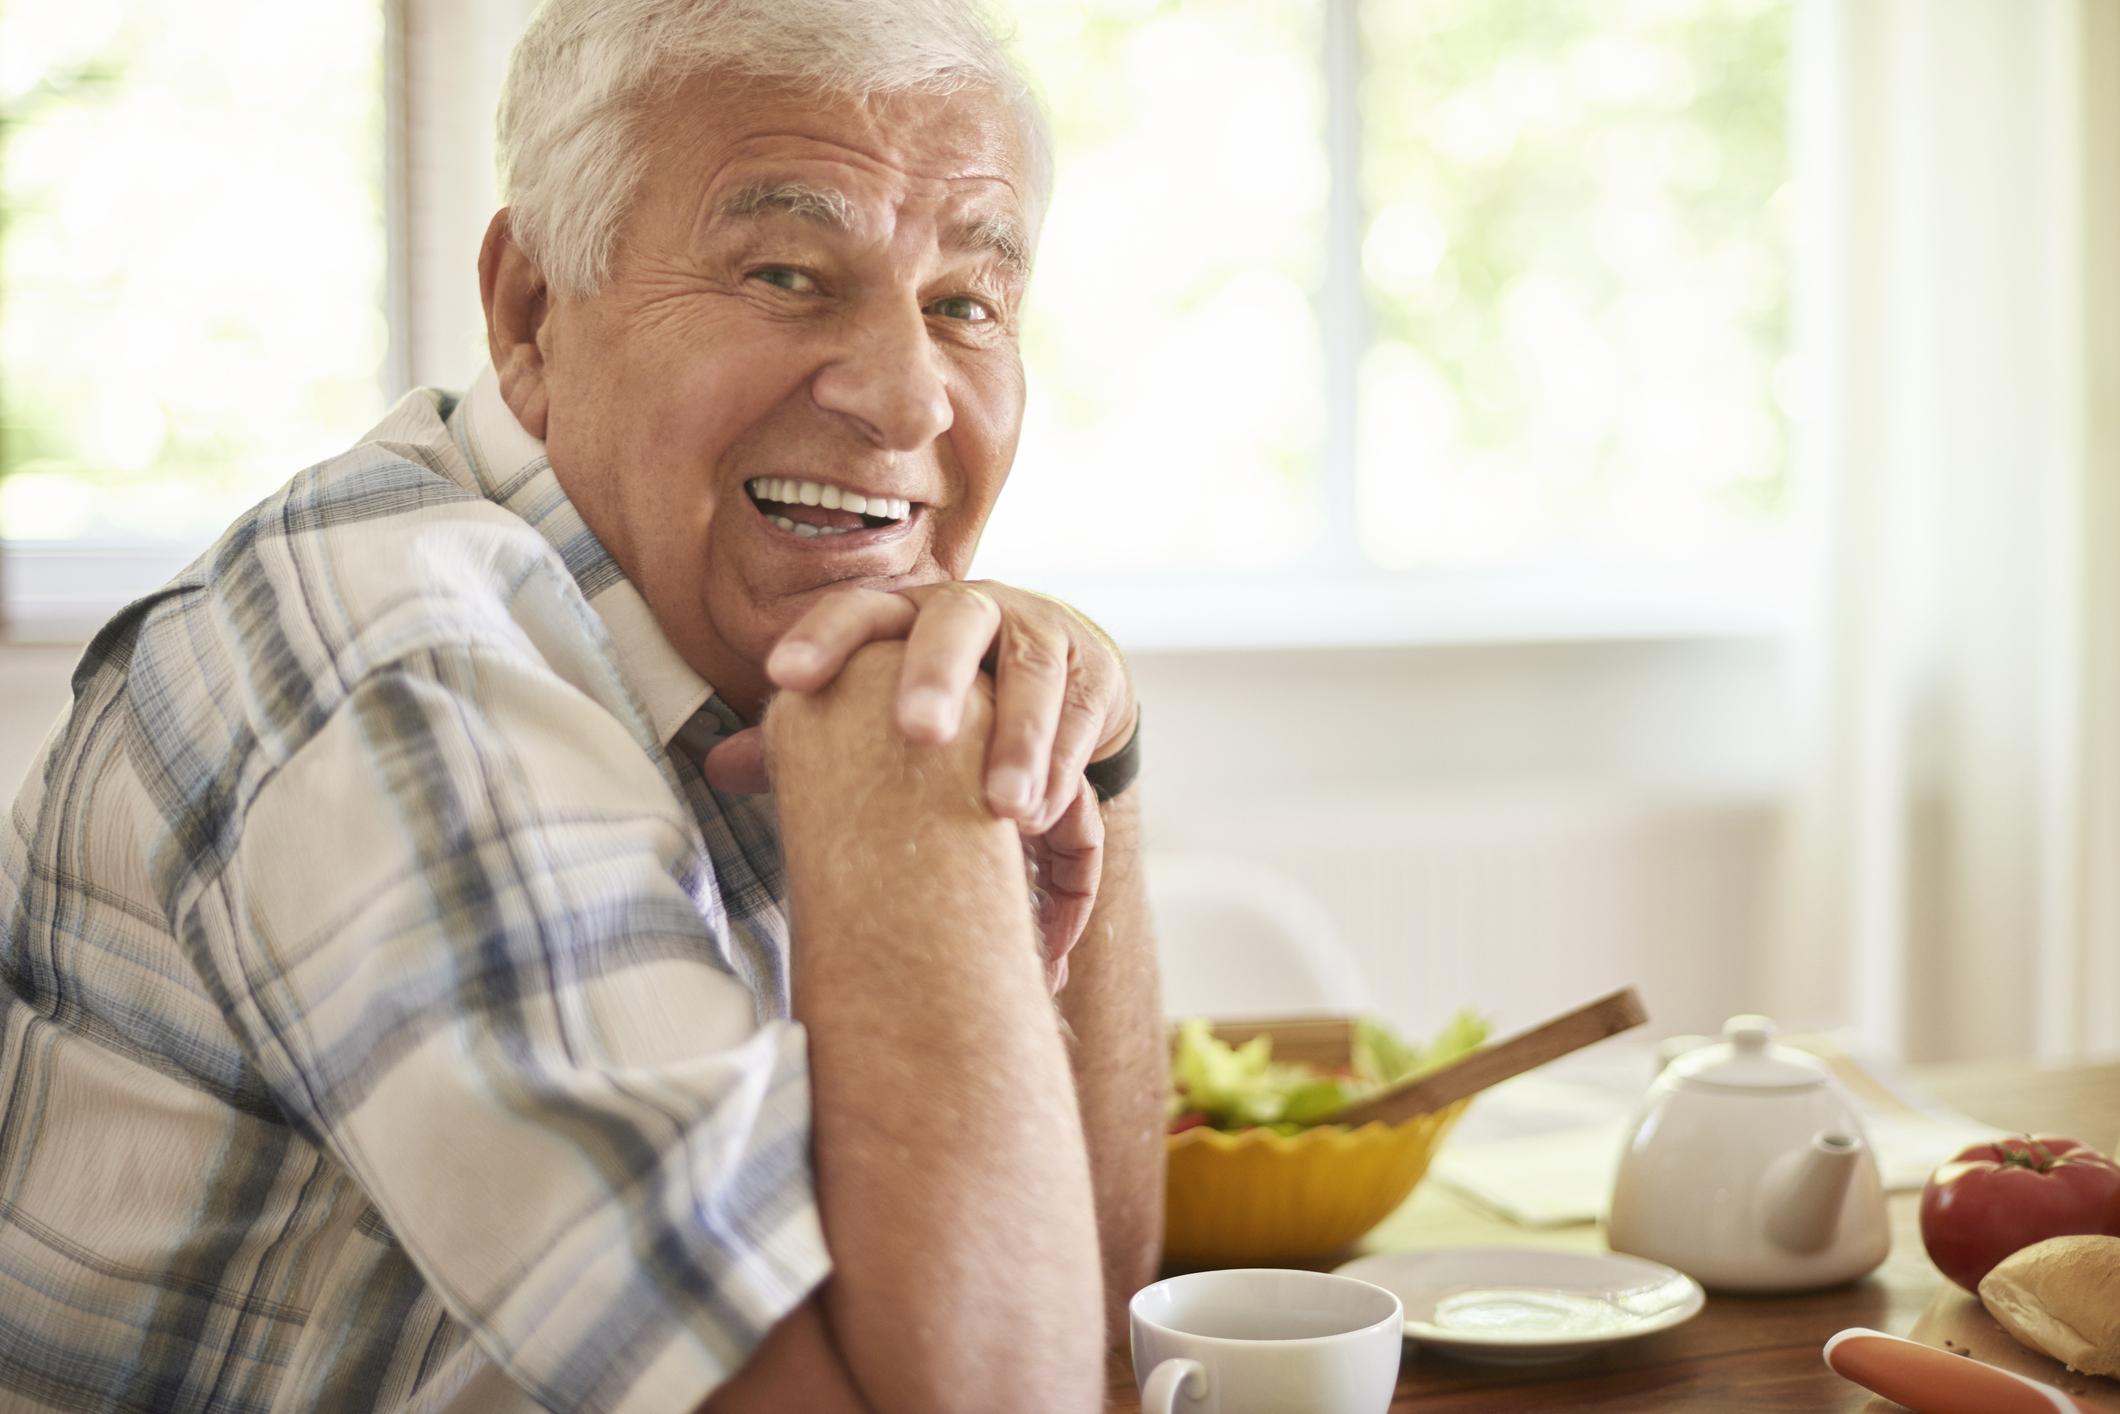 Smiling senior man in plaid shirt